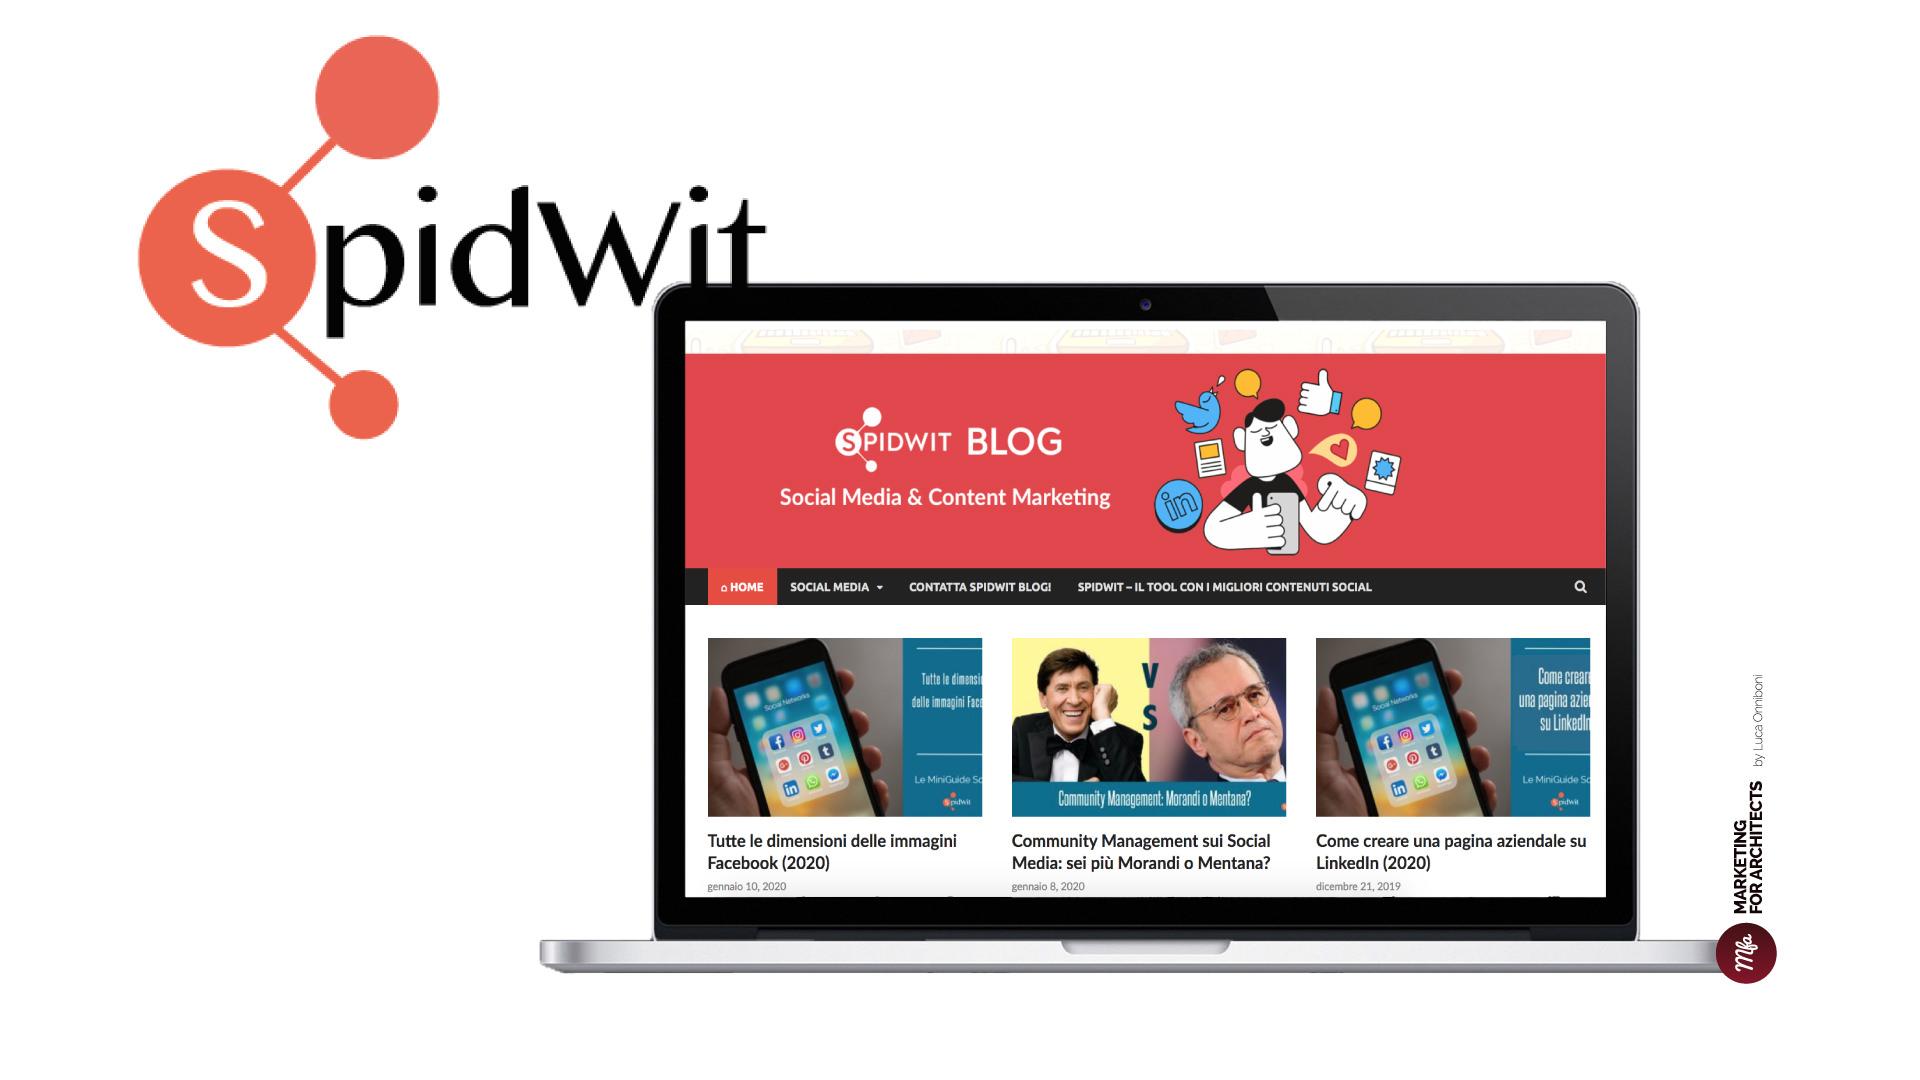 spidwit blog